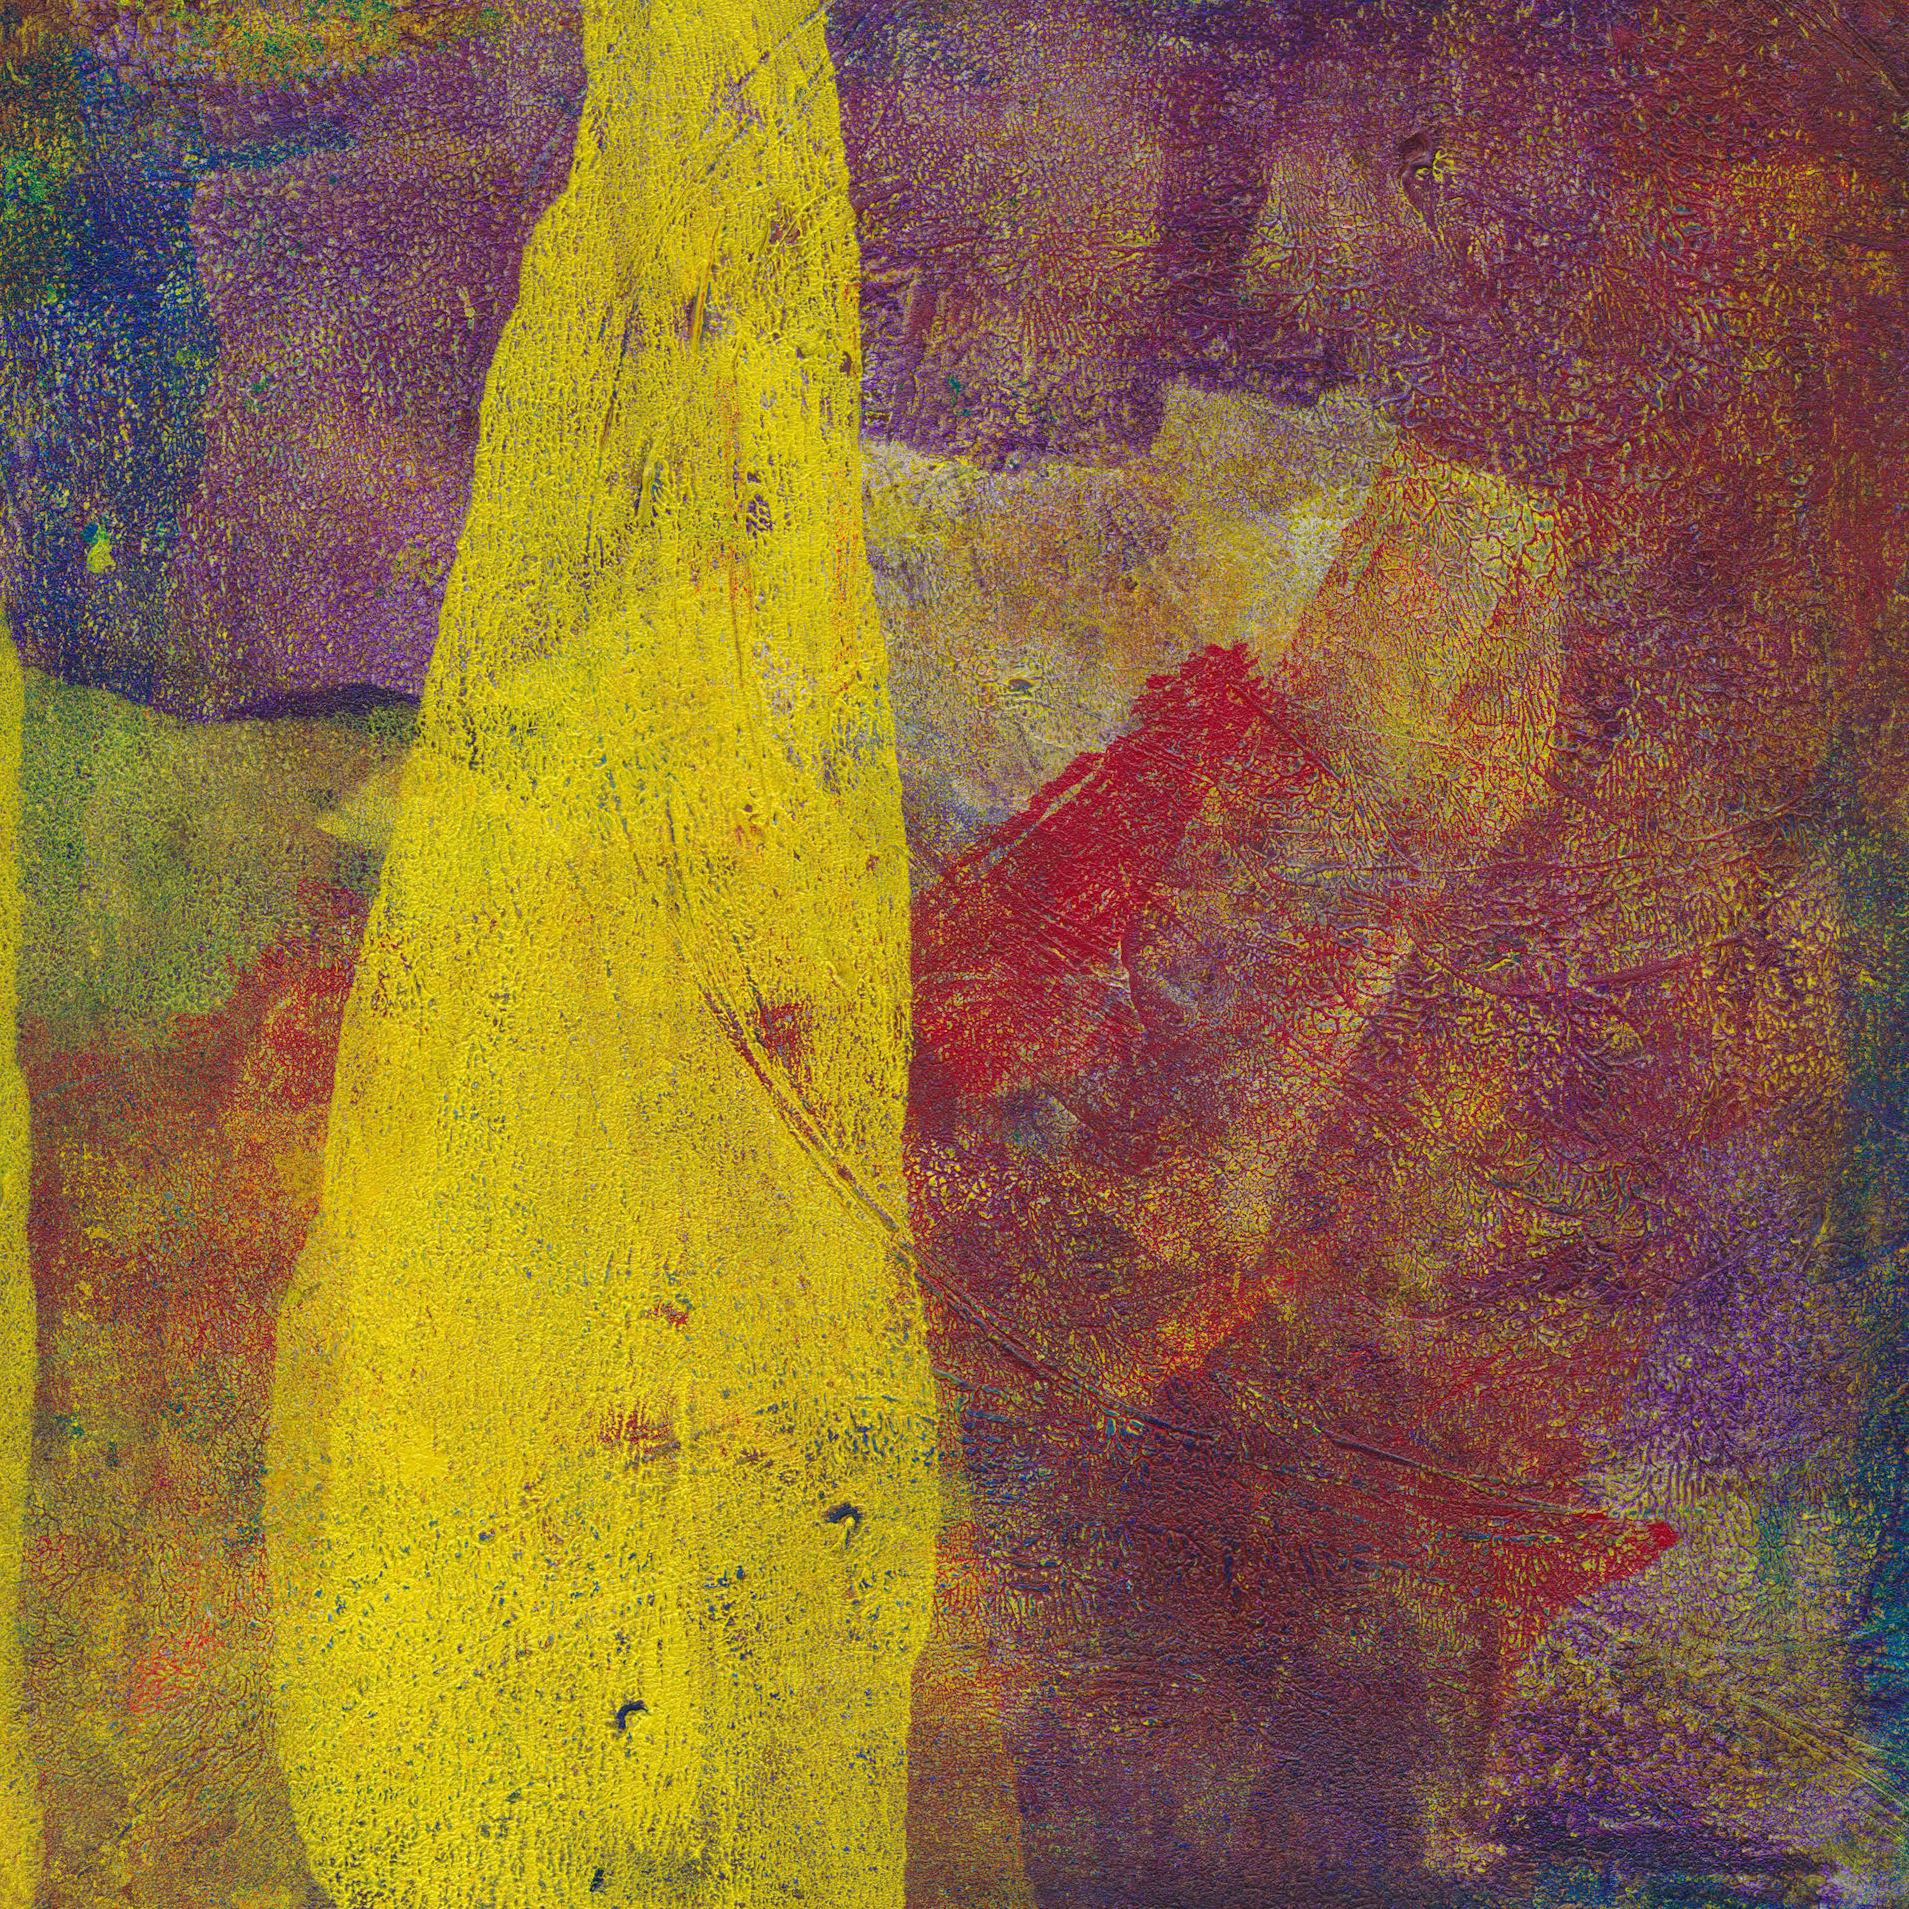 A pillar in the desert abstract landscape